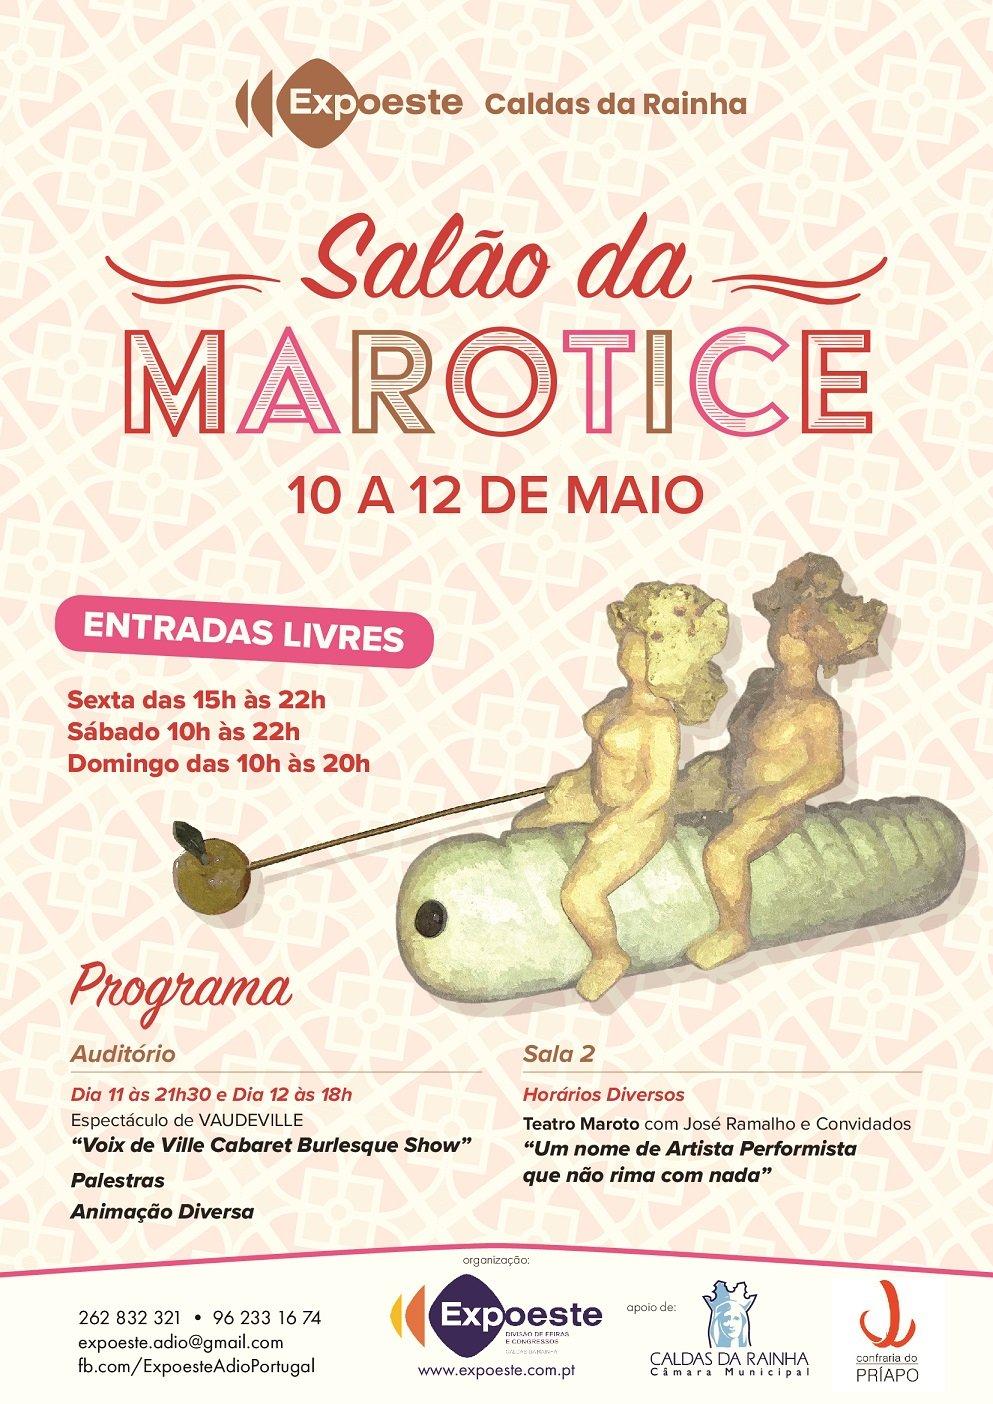 SALÃO DA MAROTICE